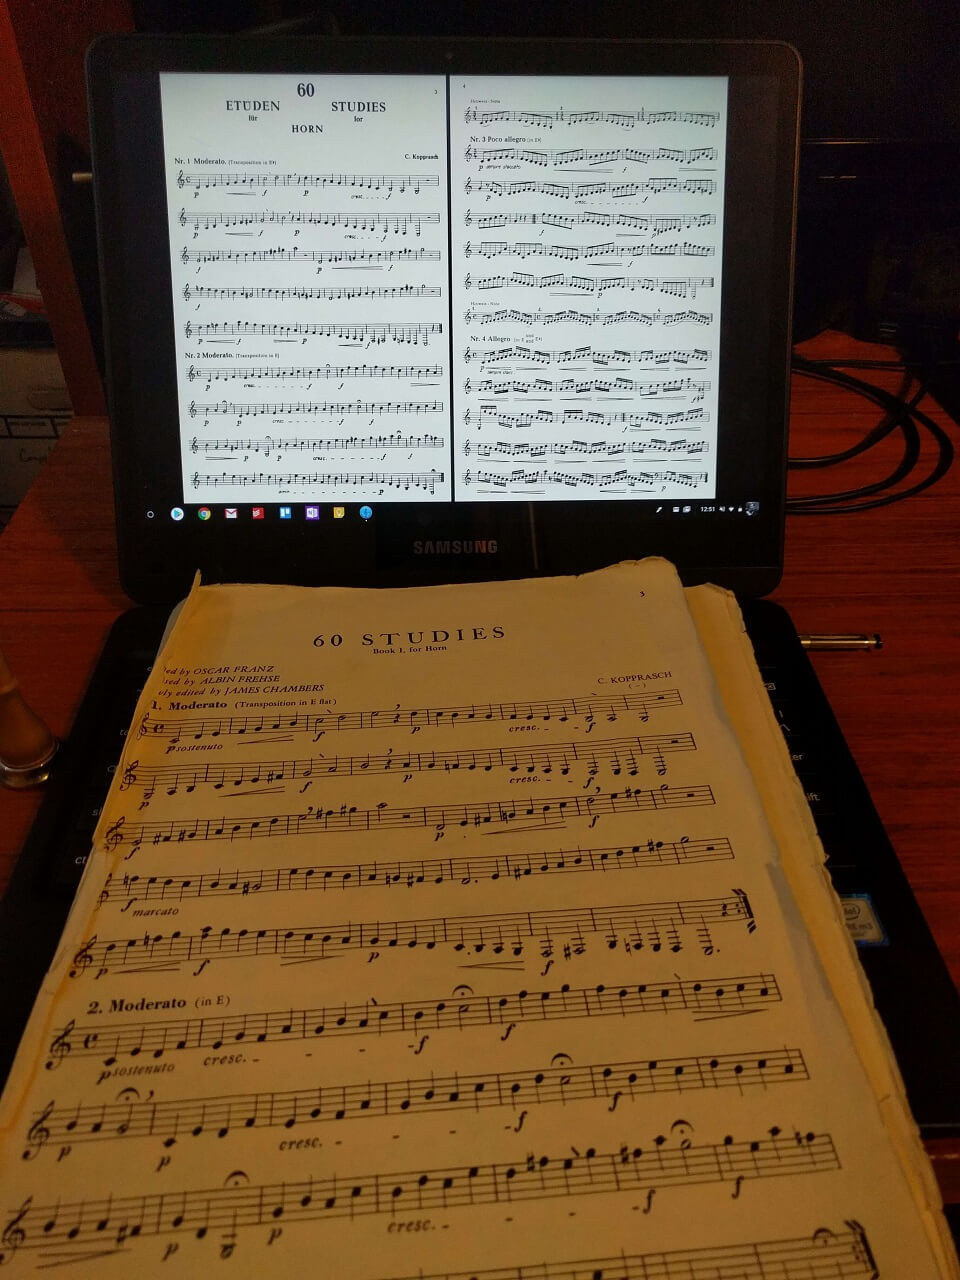 samsung pro music and stylus